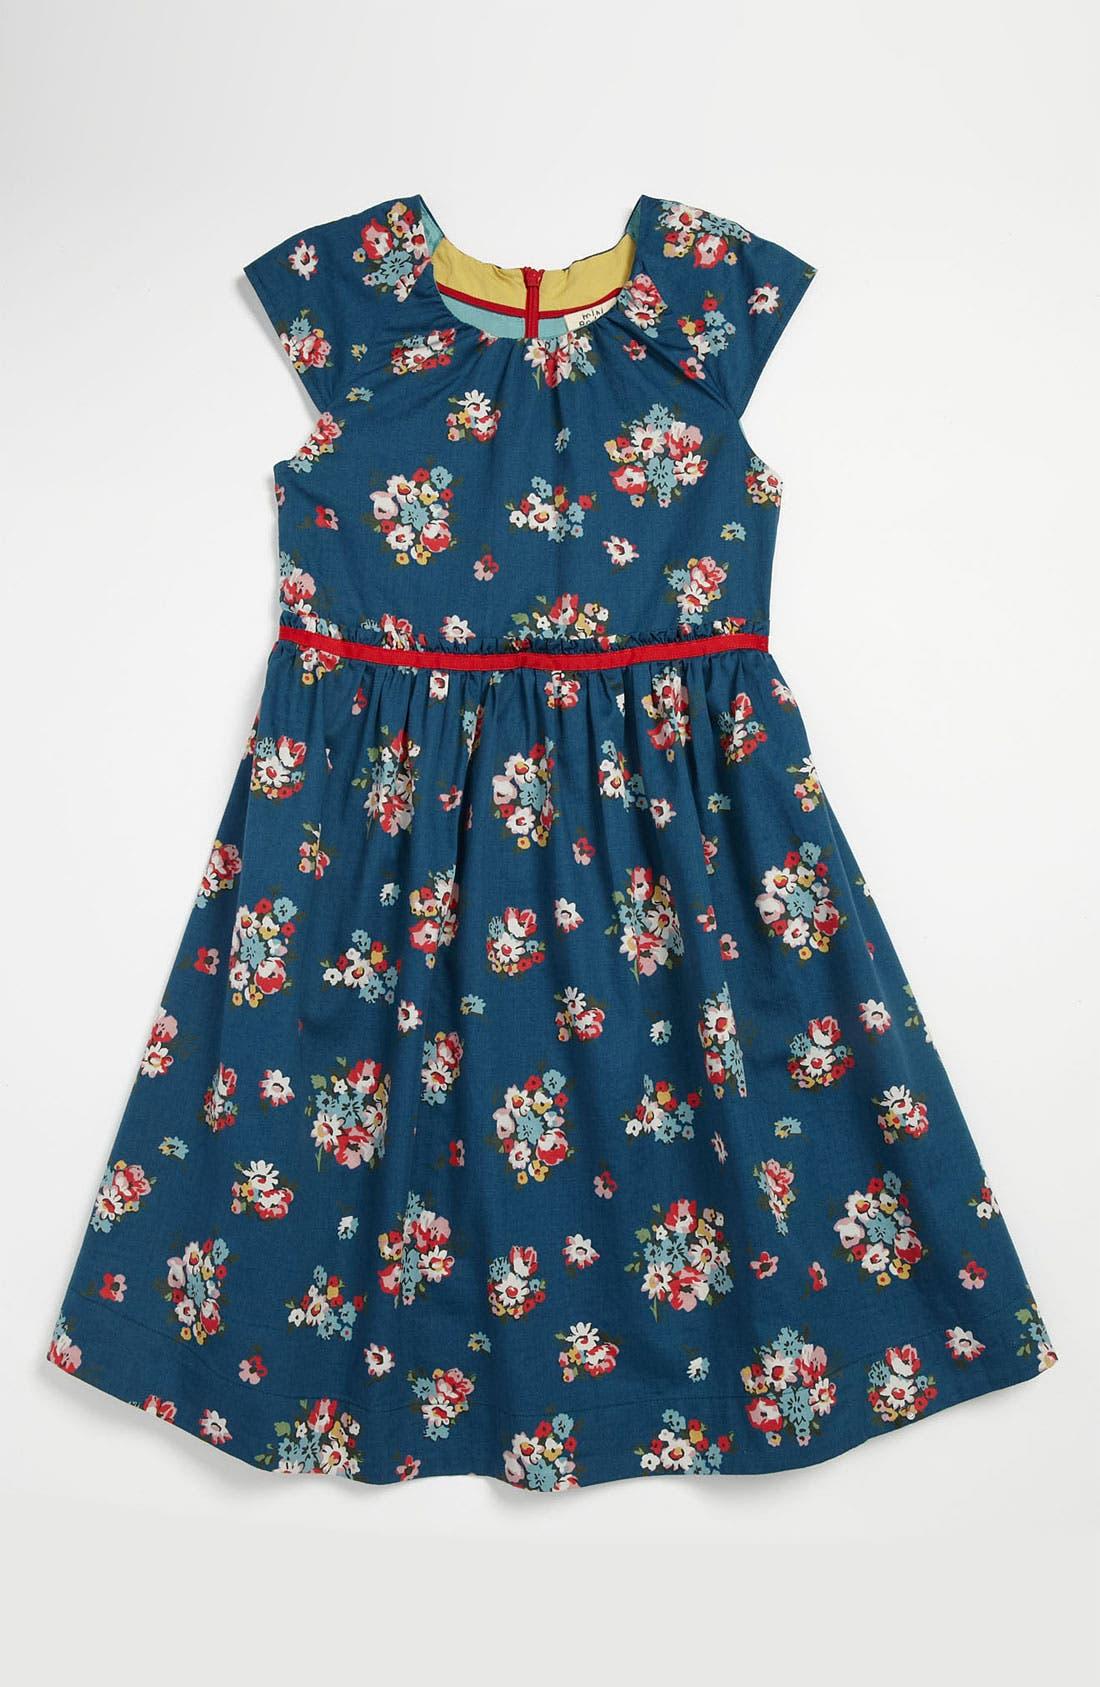 Main Image - Mini Boden Vintage Print Party Dress (Little Girls & Big Girls)